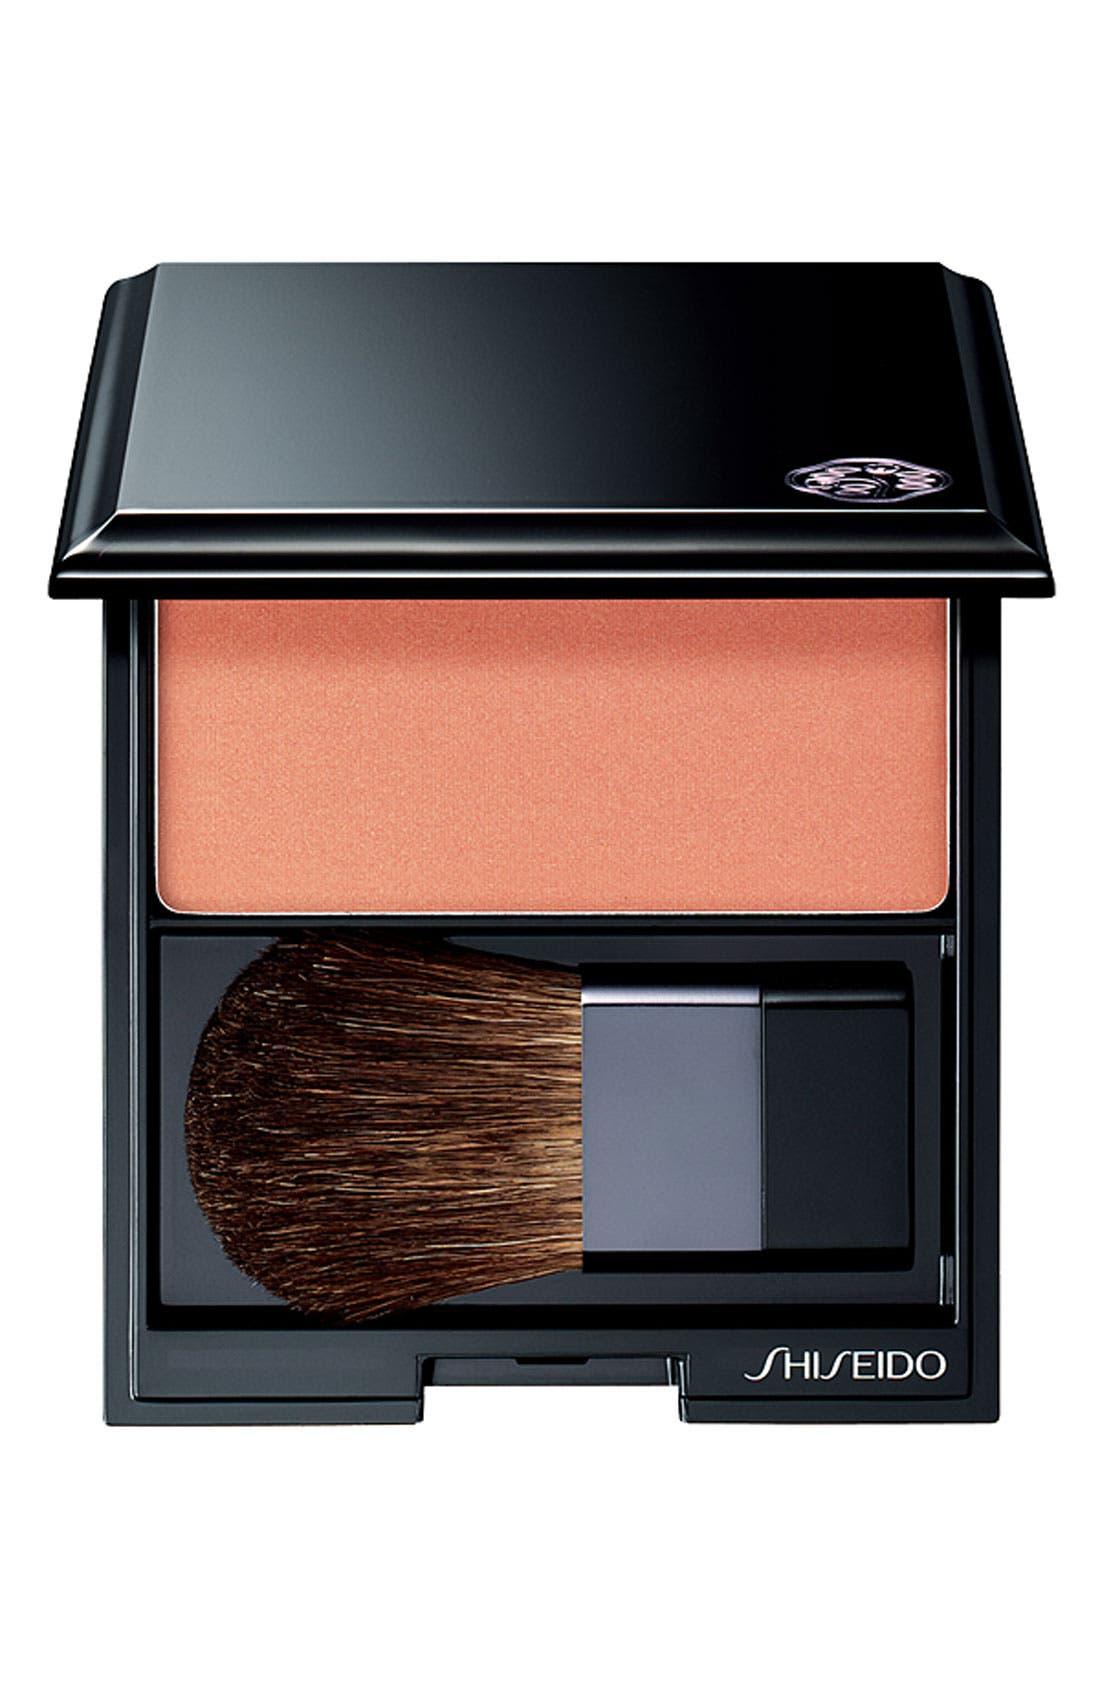 Shiseido 'The Makeup' Luminizing Satin Face Color